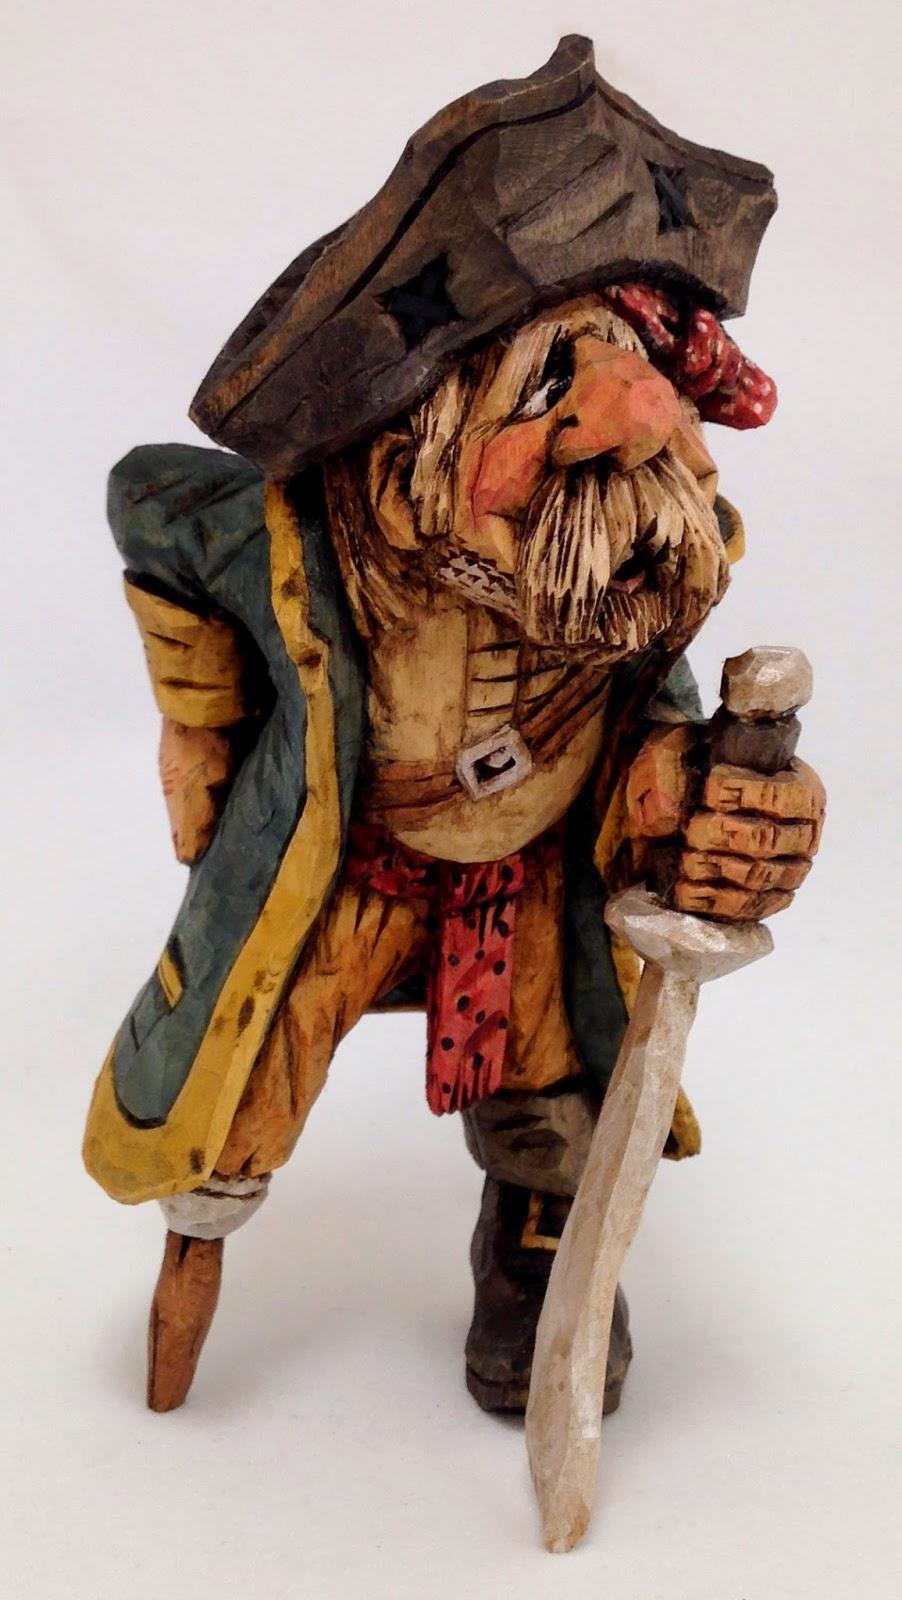 North idaho carver pirate